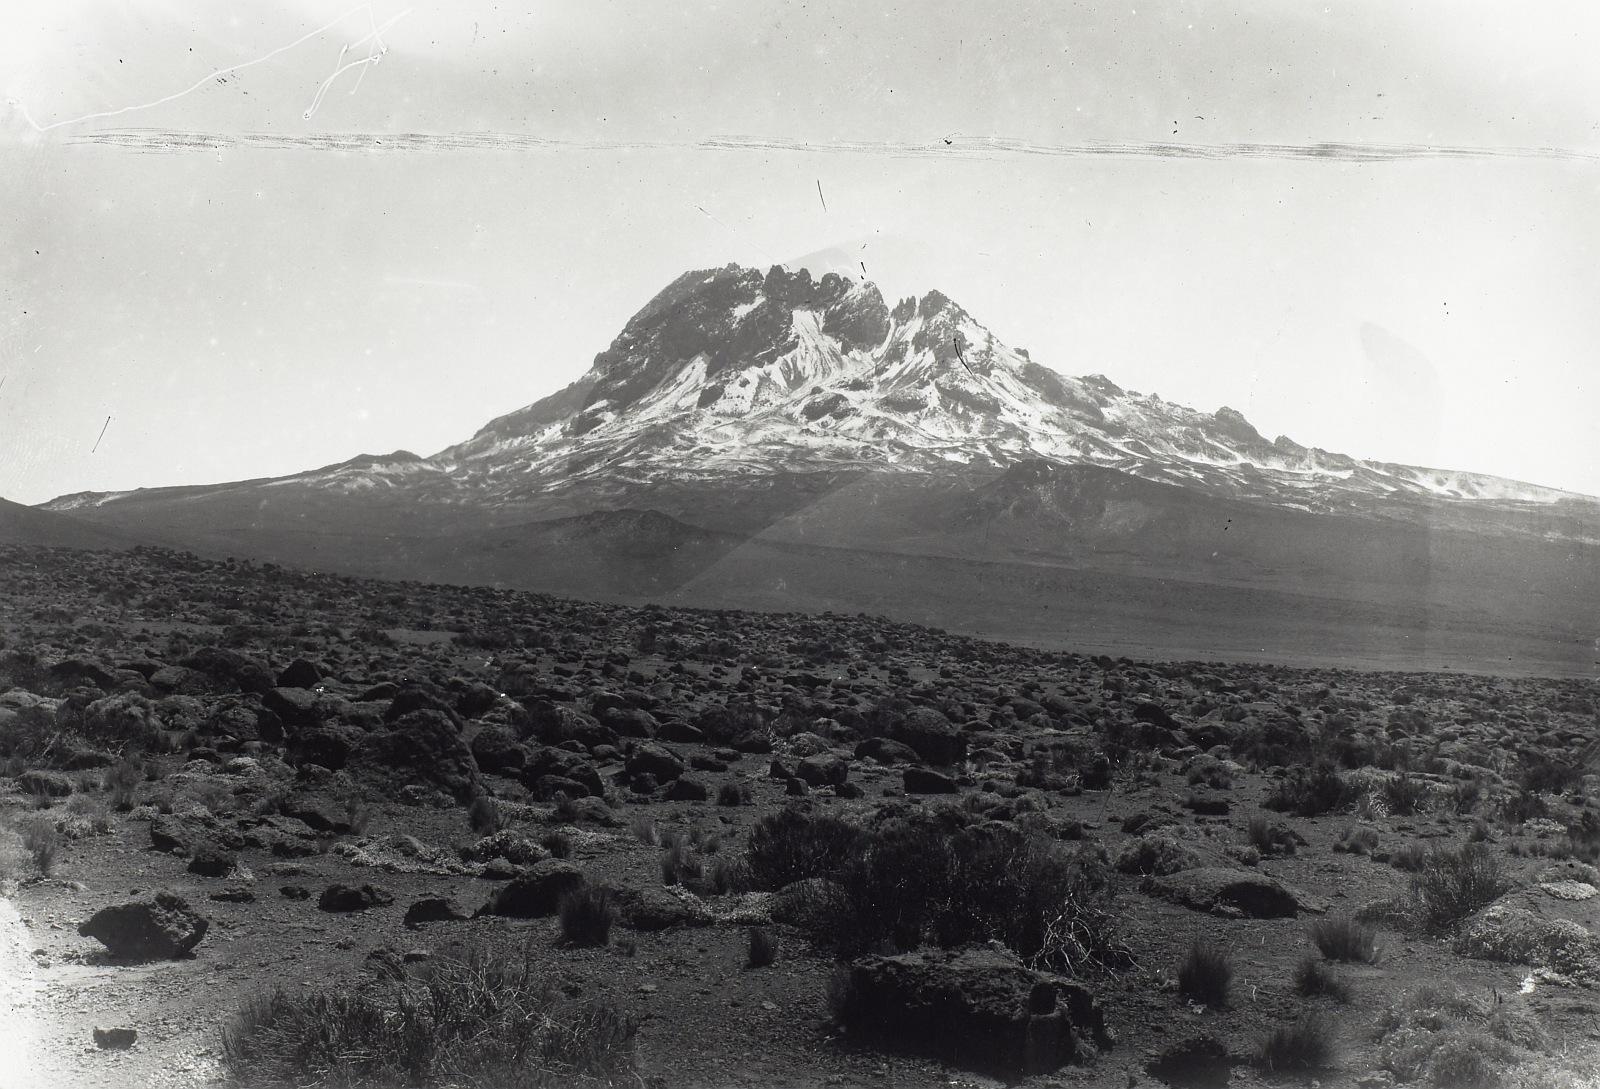 27. Килиманджаро. Мавенси со свежим снегом